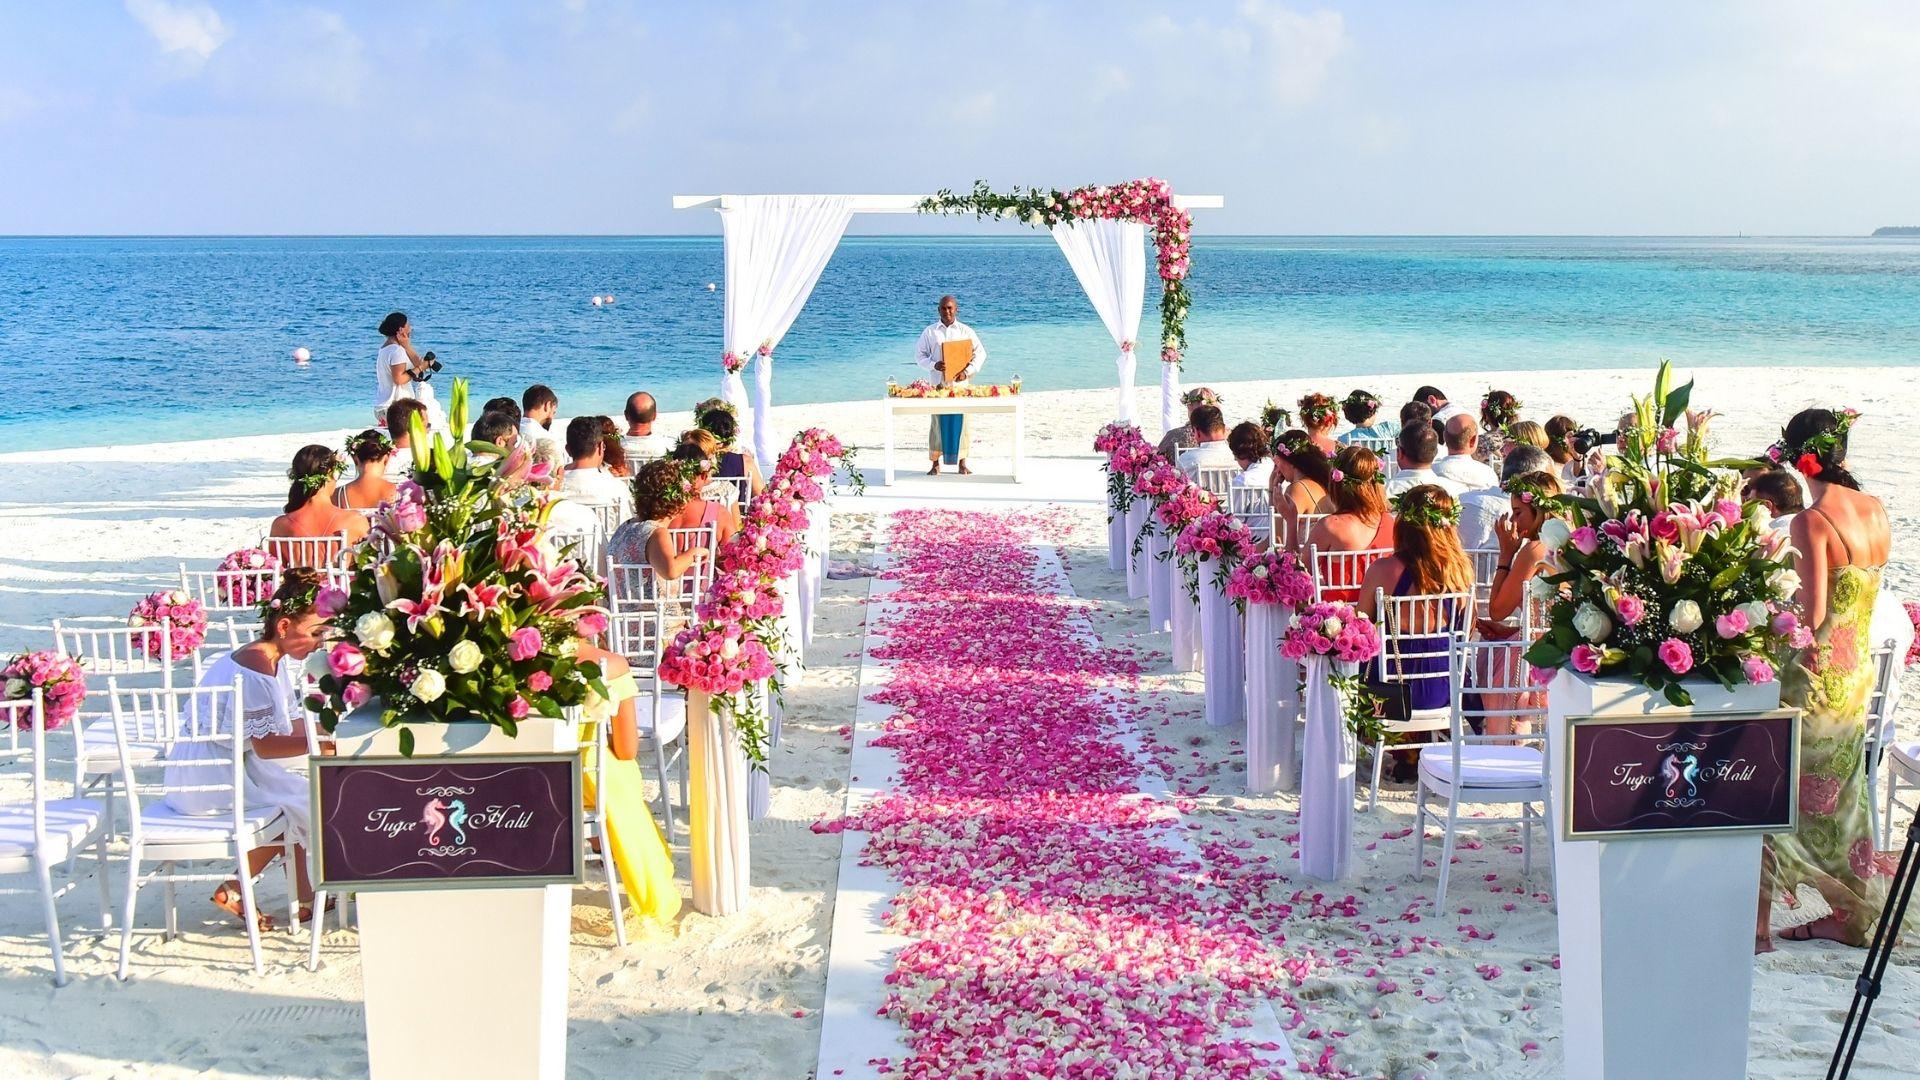 wedding planner organisation mariage nice alpes maritimes 06 paca